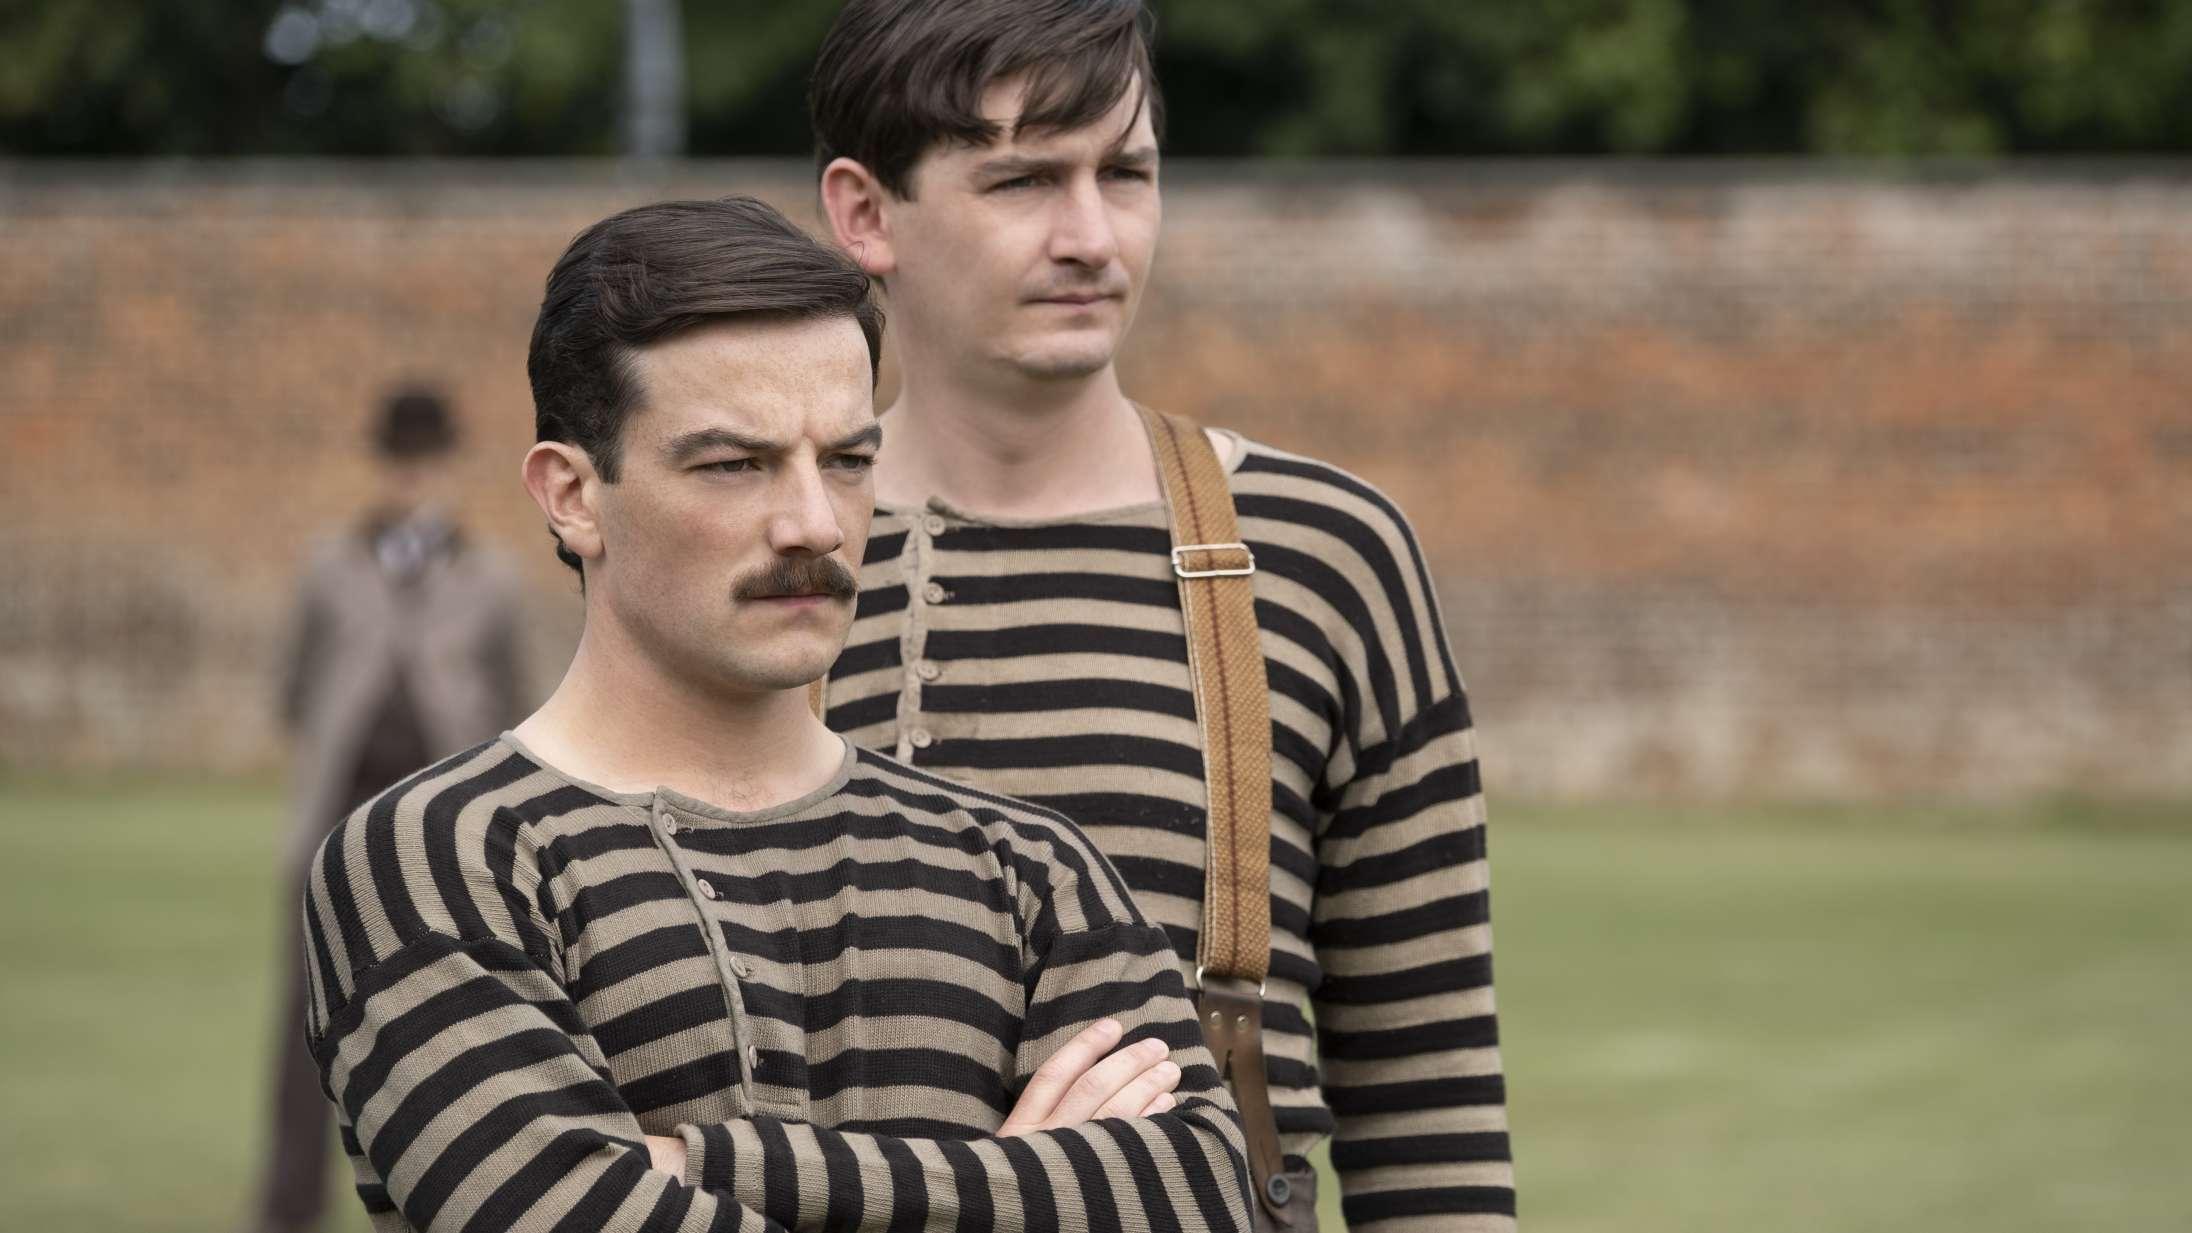 'The English Game': Fodboldhistorien 'Downton Abbey'-style er en herlig guilty pleasure på Netflix